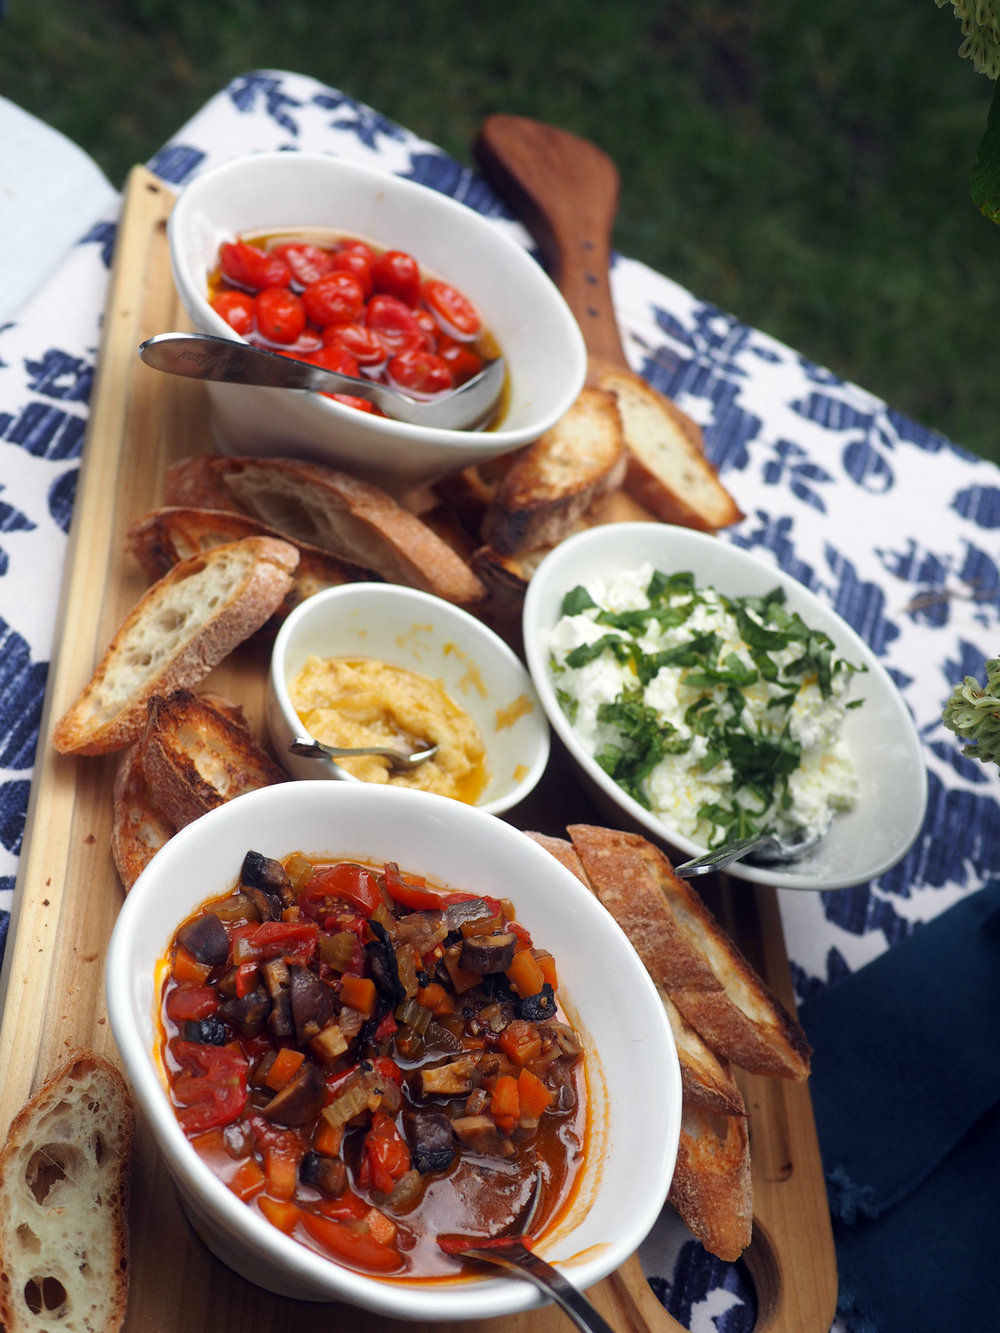 Roasted tomatoes, garlic, mushroom bolognese, ricotta, crostini.